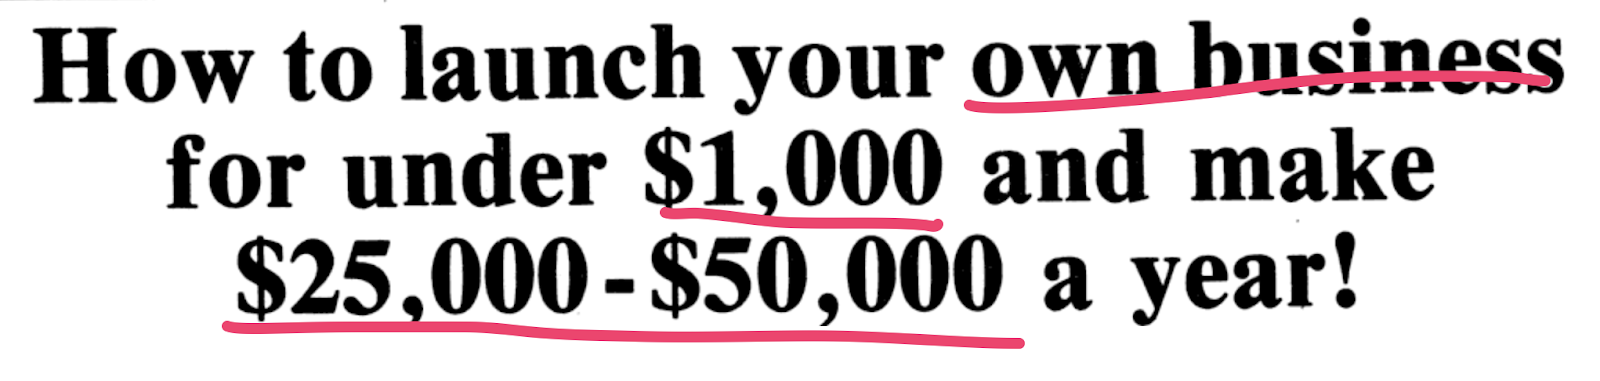 Gary Bencivenga Headline With Greed Power Words